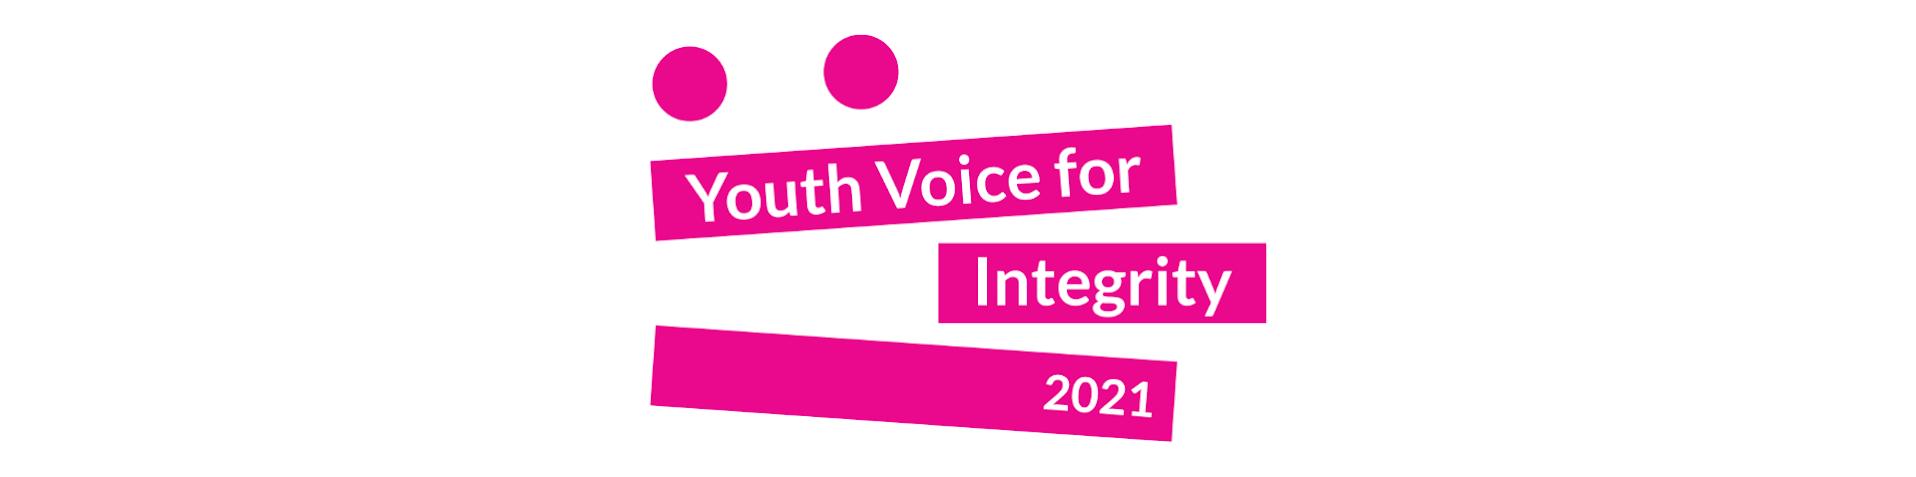 Poziv za sudjelovanje u projektu Youth Voice for Integrity 2021